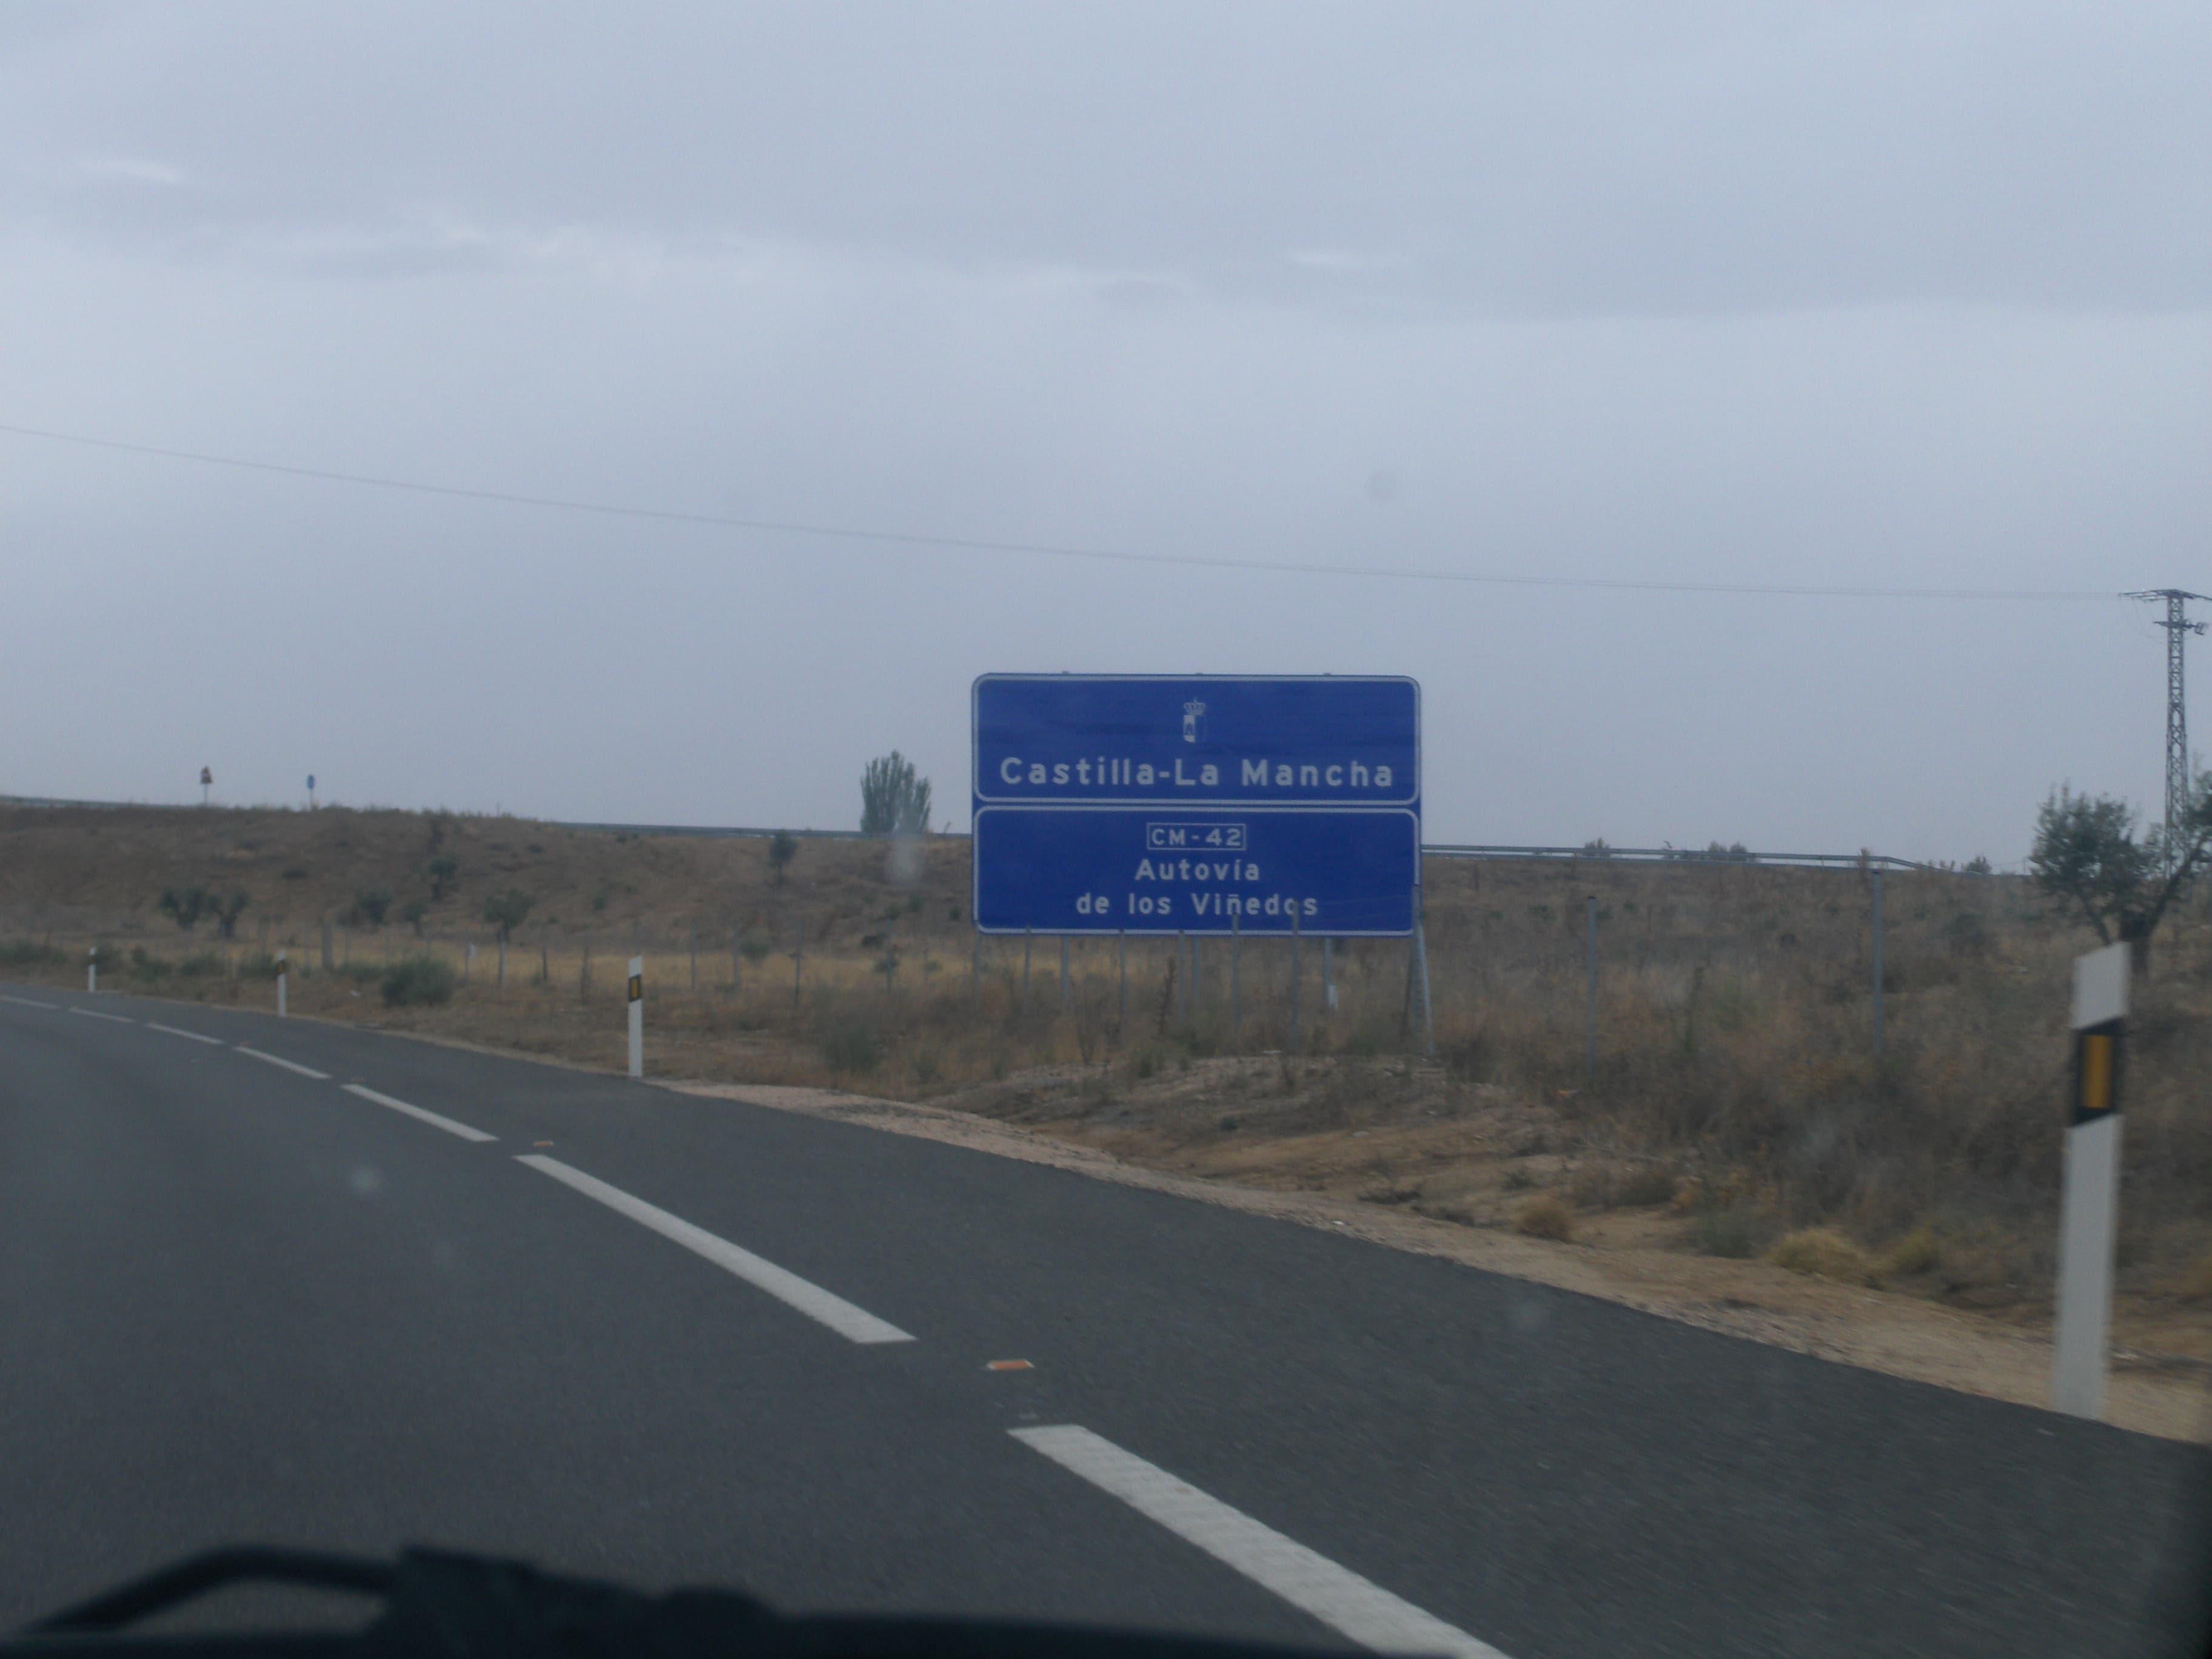 Autovia CM 42 - Inaugurada la autovía de los Viñedos